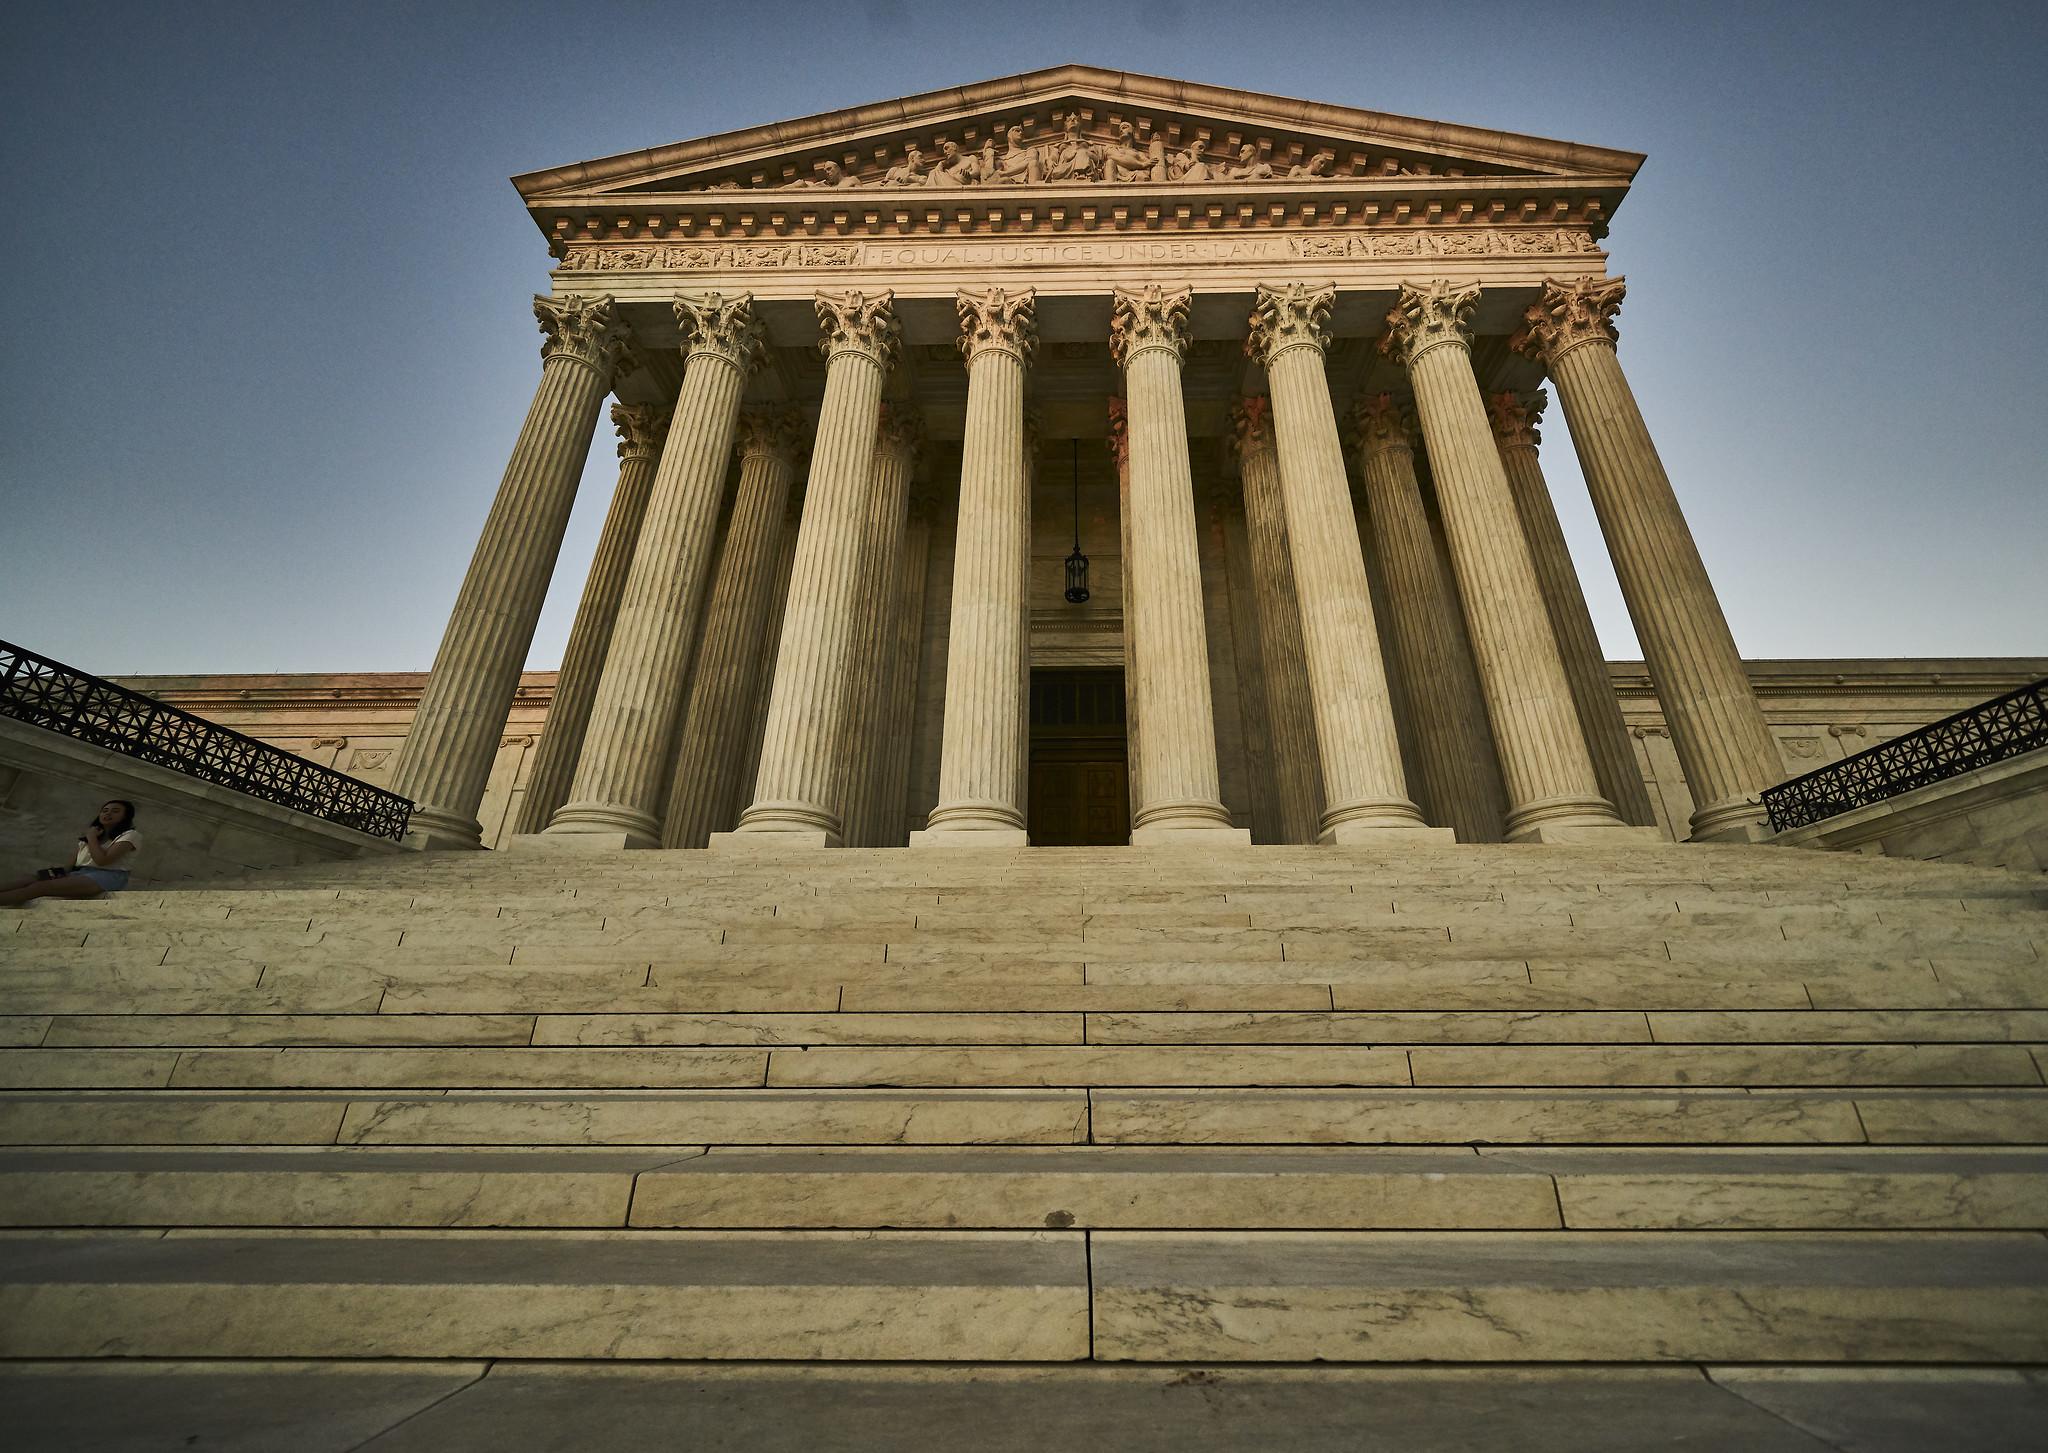 College athletes score a big win in the U.S. Supreme Court in NCAA dispute